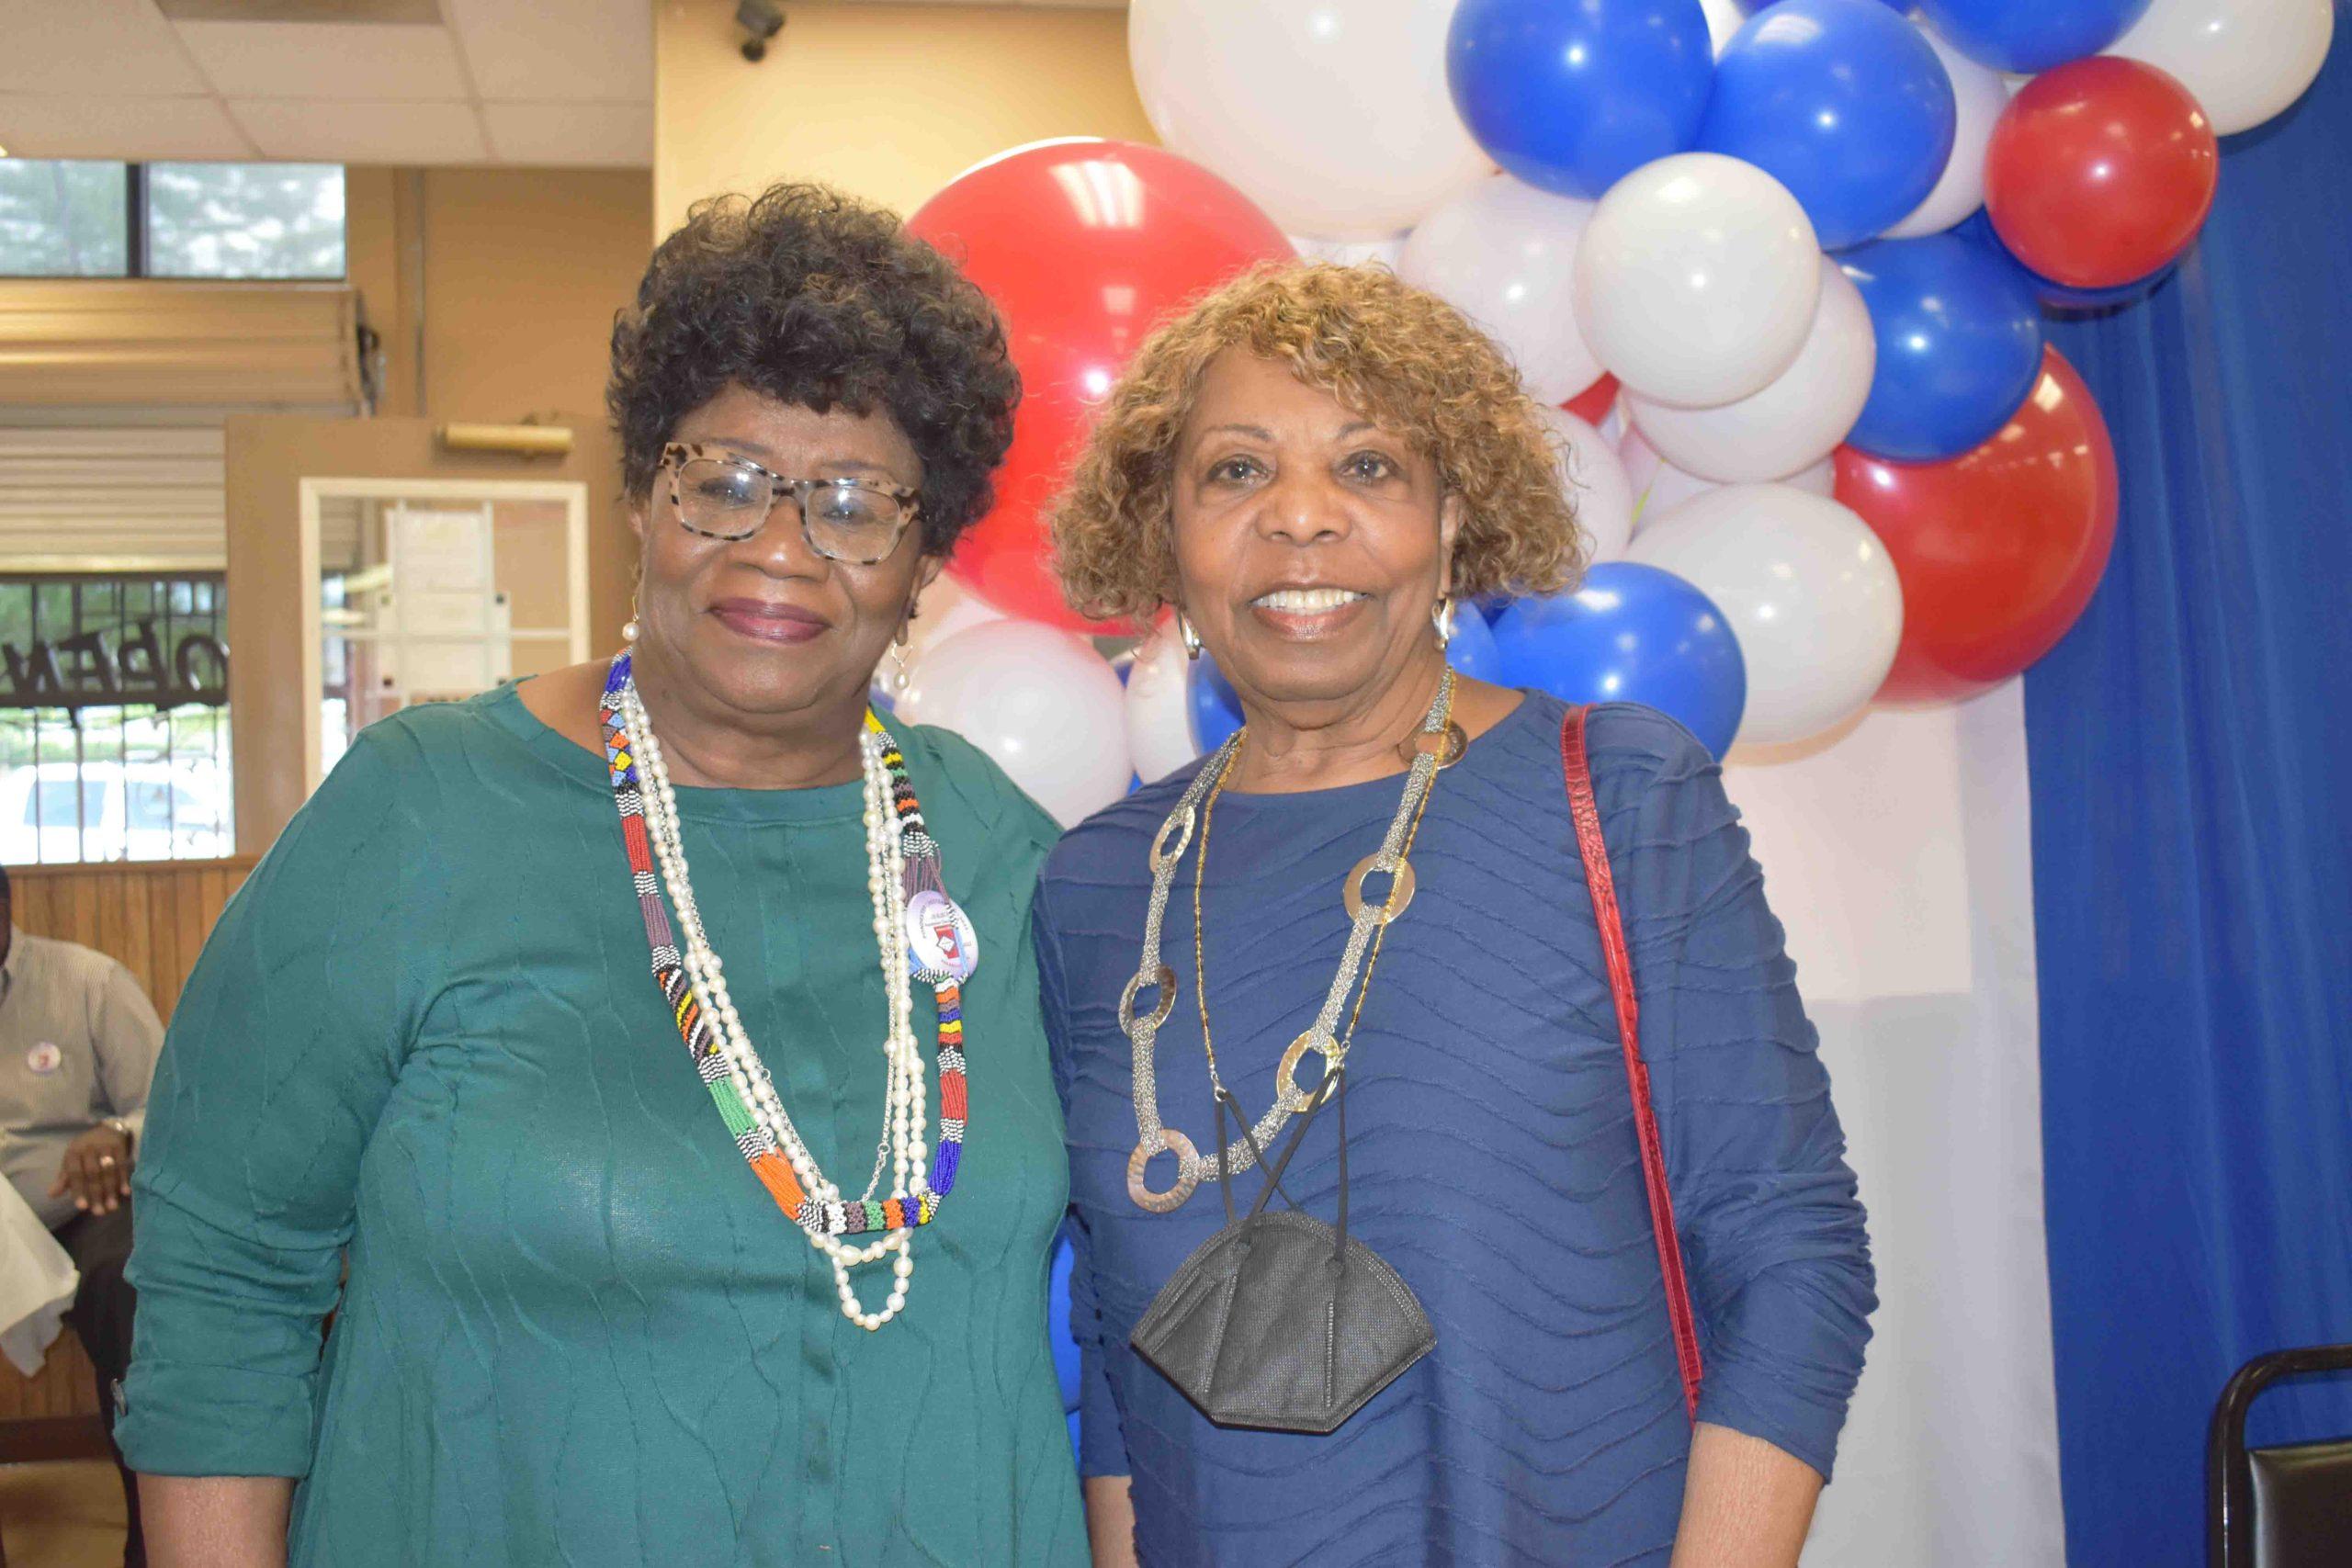 Sen. Linda Chesterfield, Hon. Lottie Shackleford